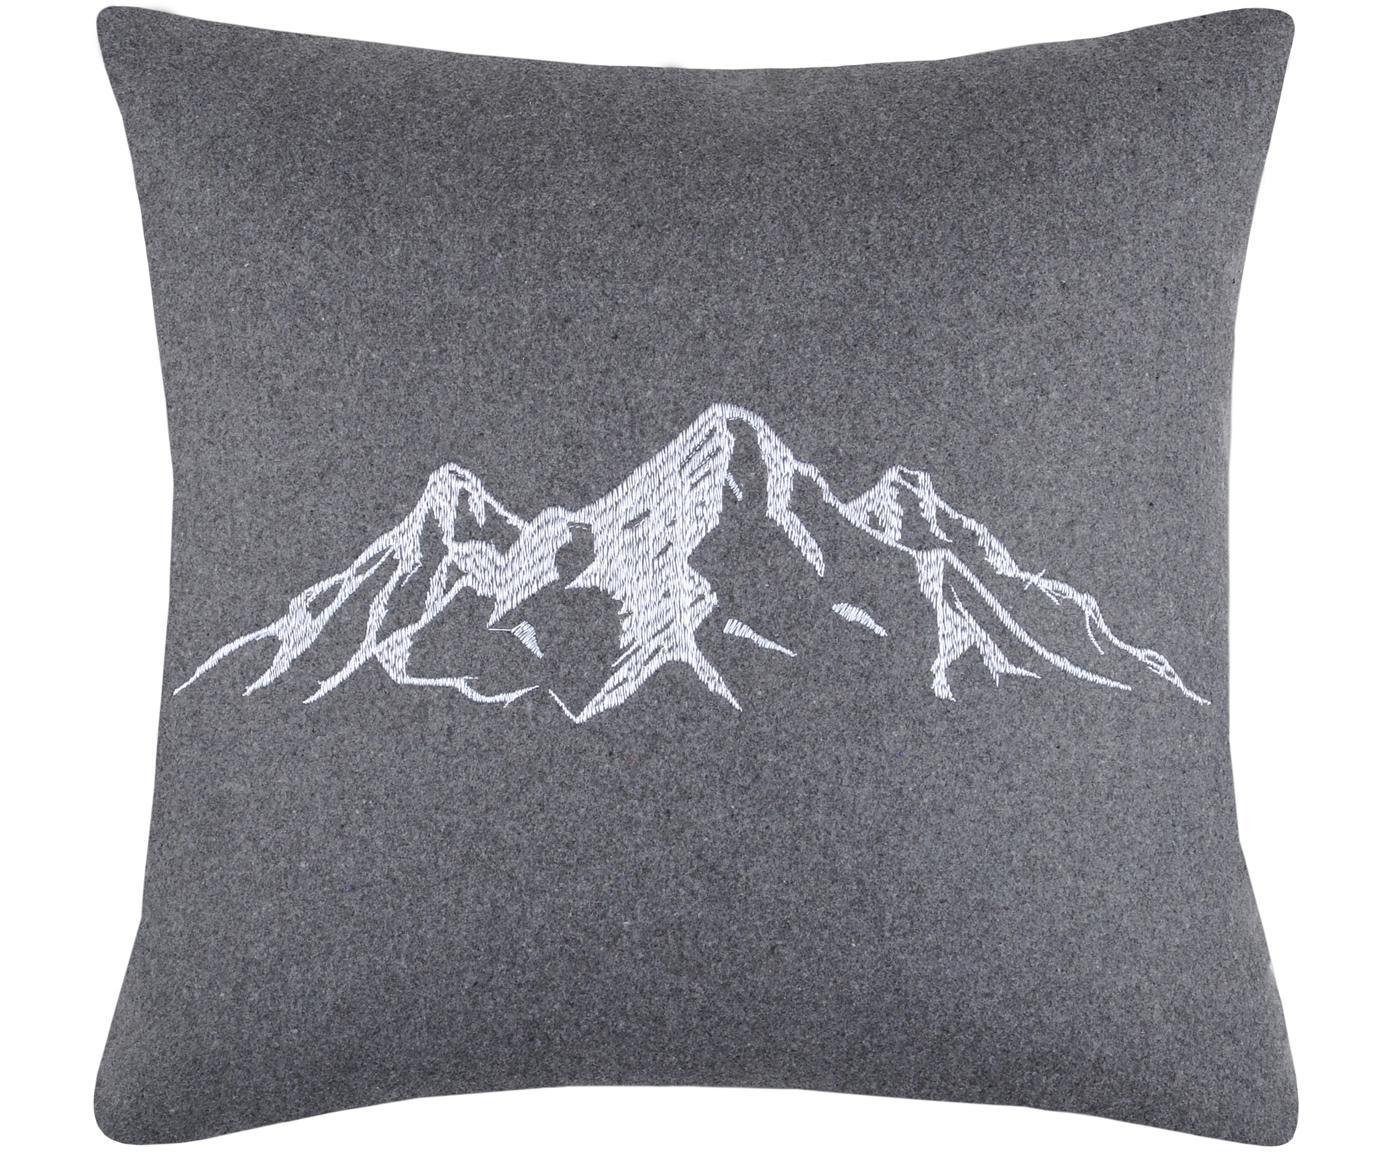 Cuscino con imbottitura Charvin, Rivestimento: 95% poliestere, 5% lana, Grigio, Larg. 45 x Lung. 45 cm